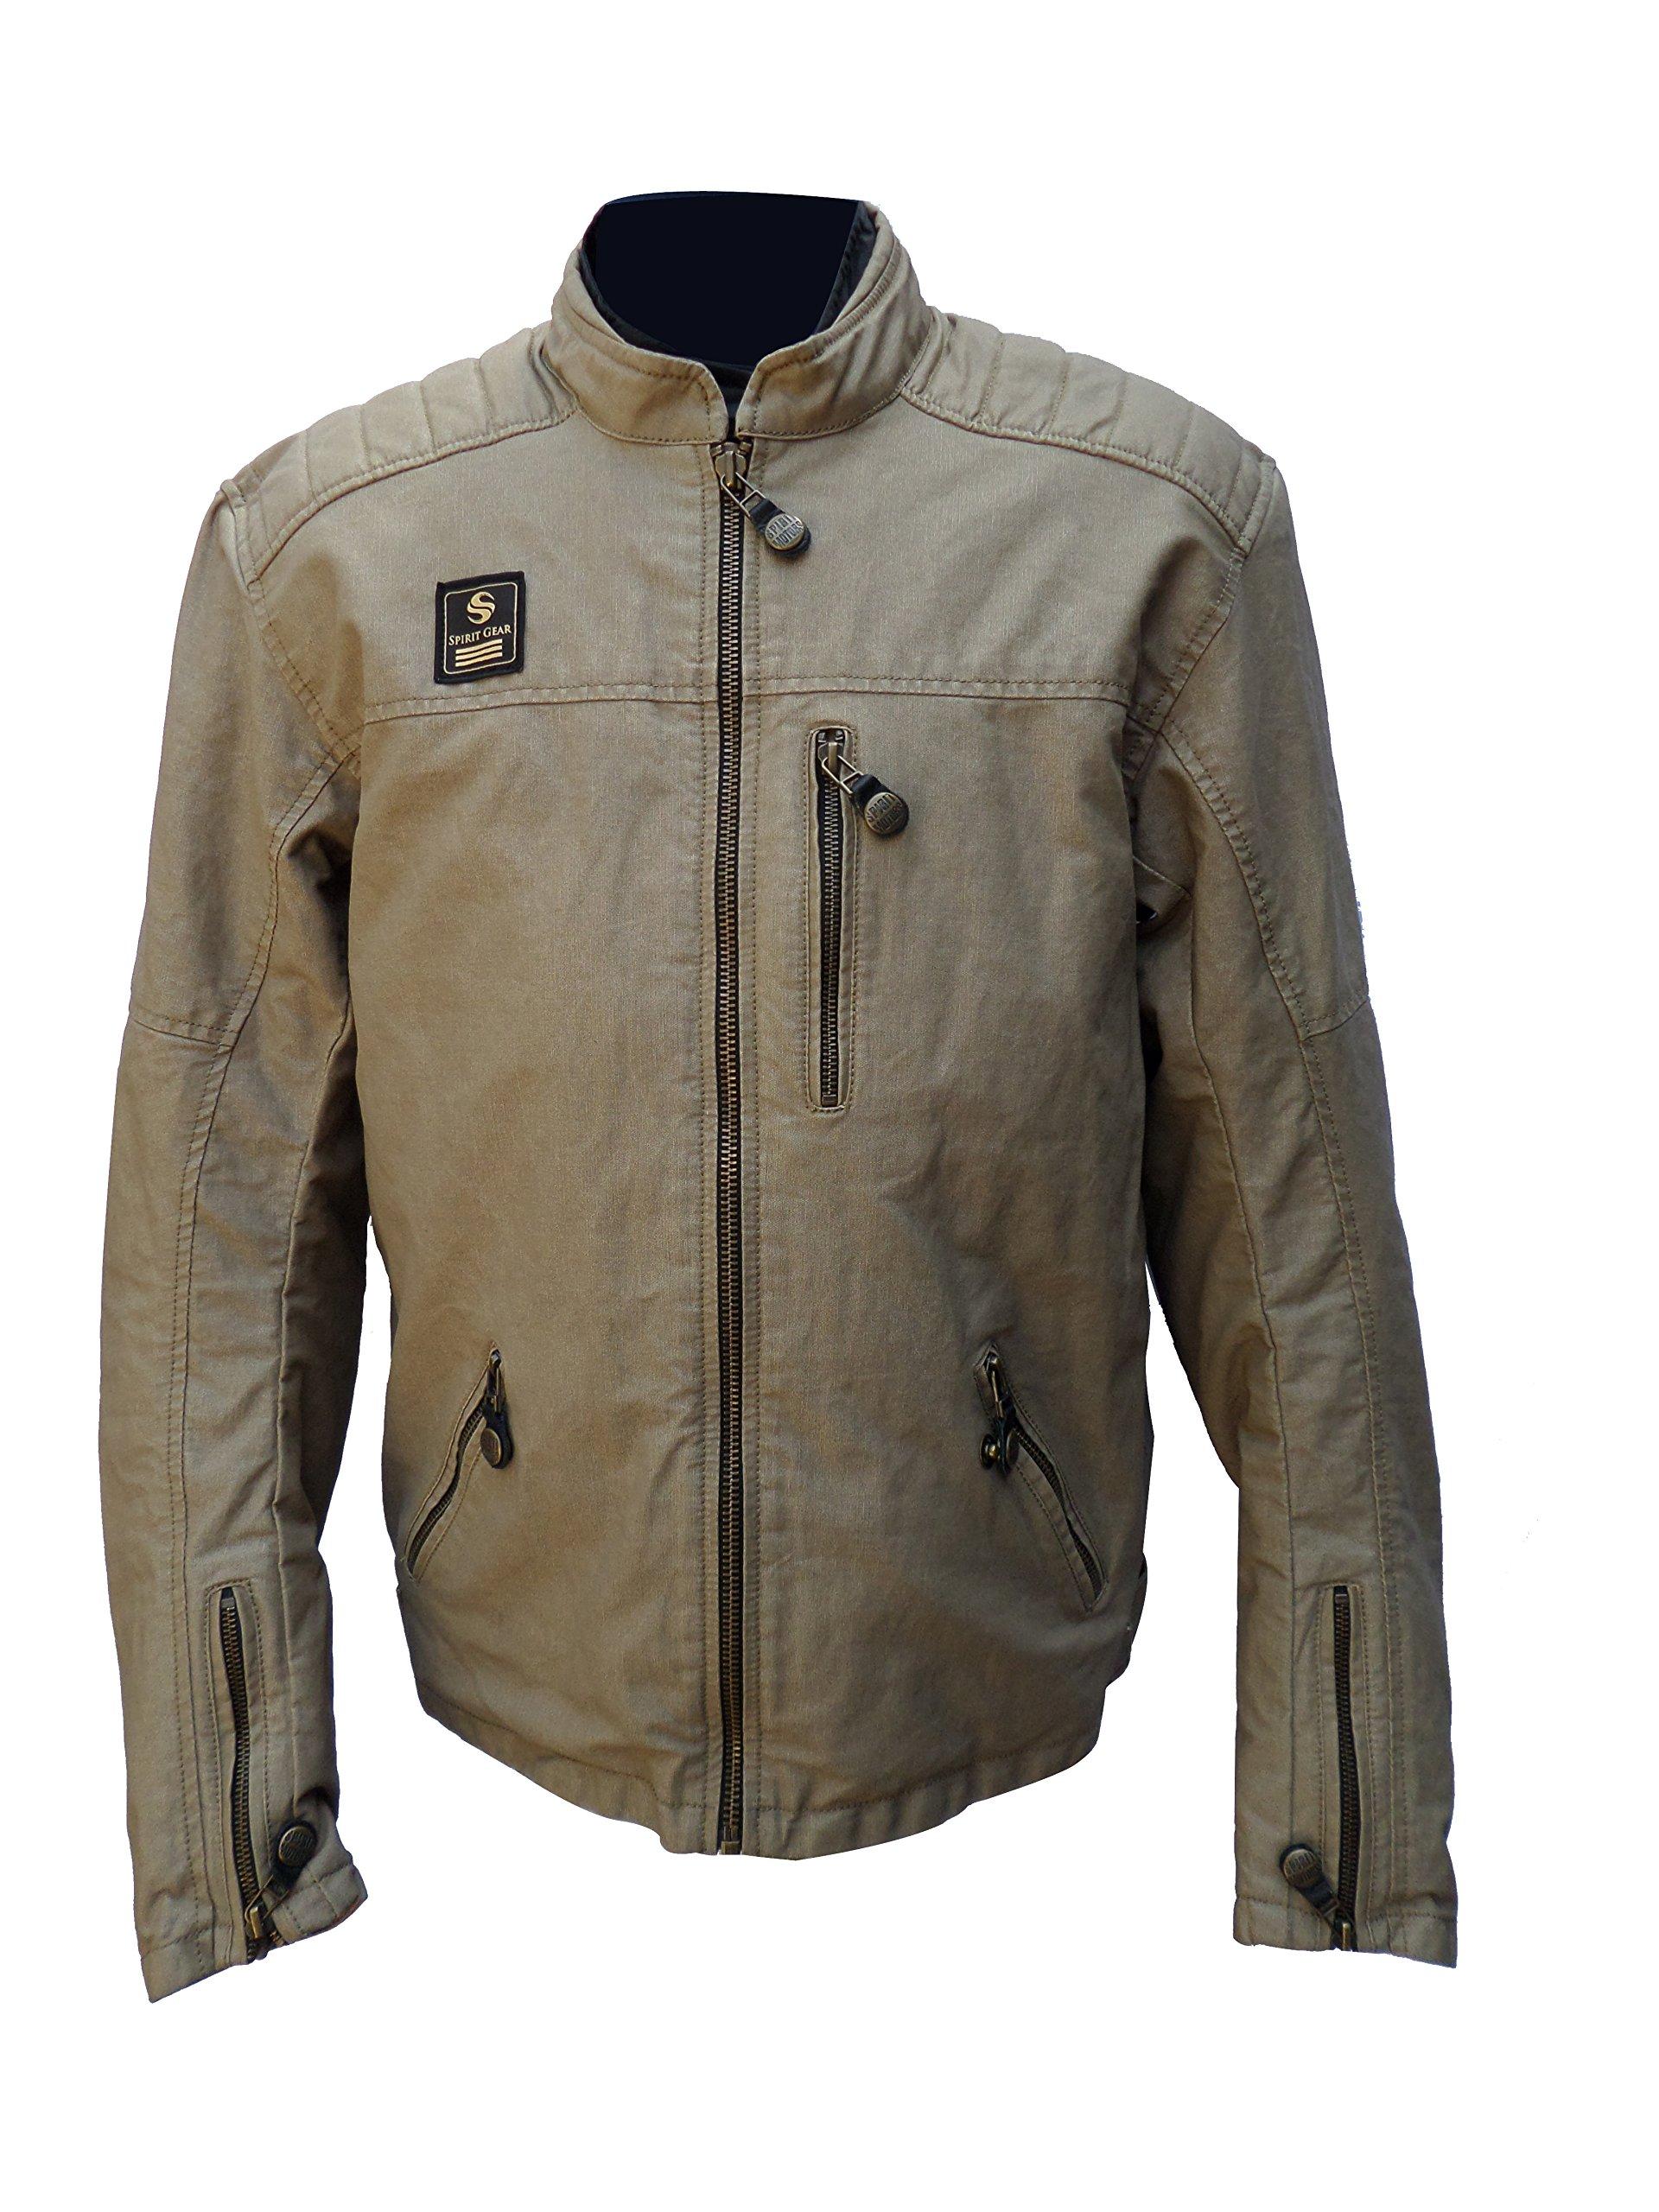 Men's Garry Sand Motorcycle Wax Cotton Armoured Jacket. GRAY